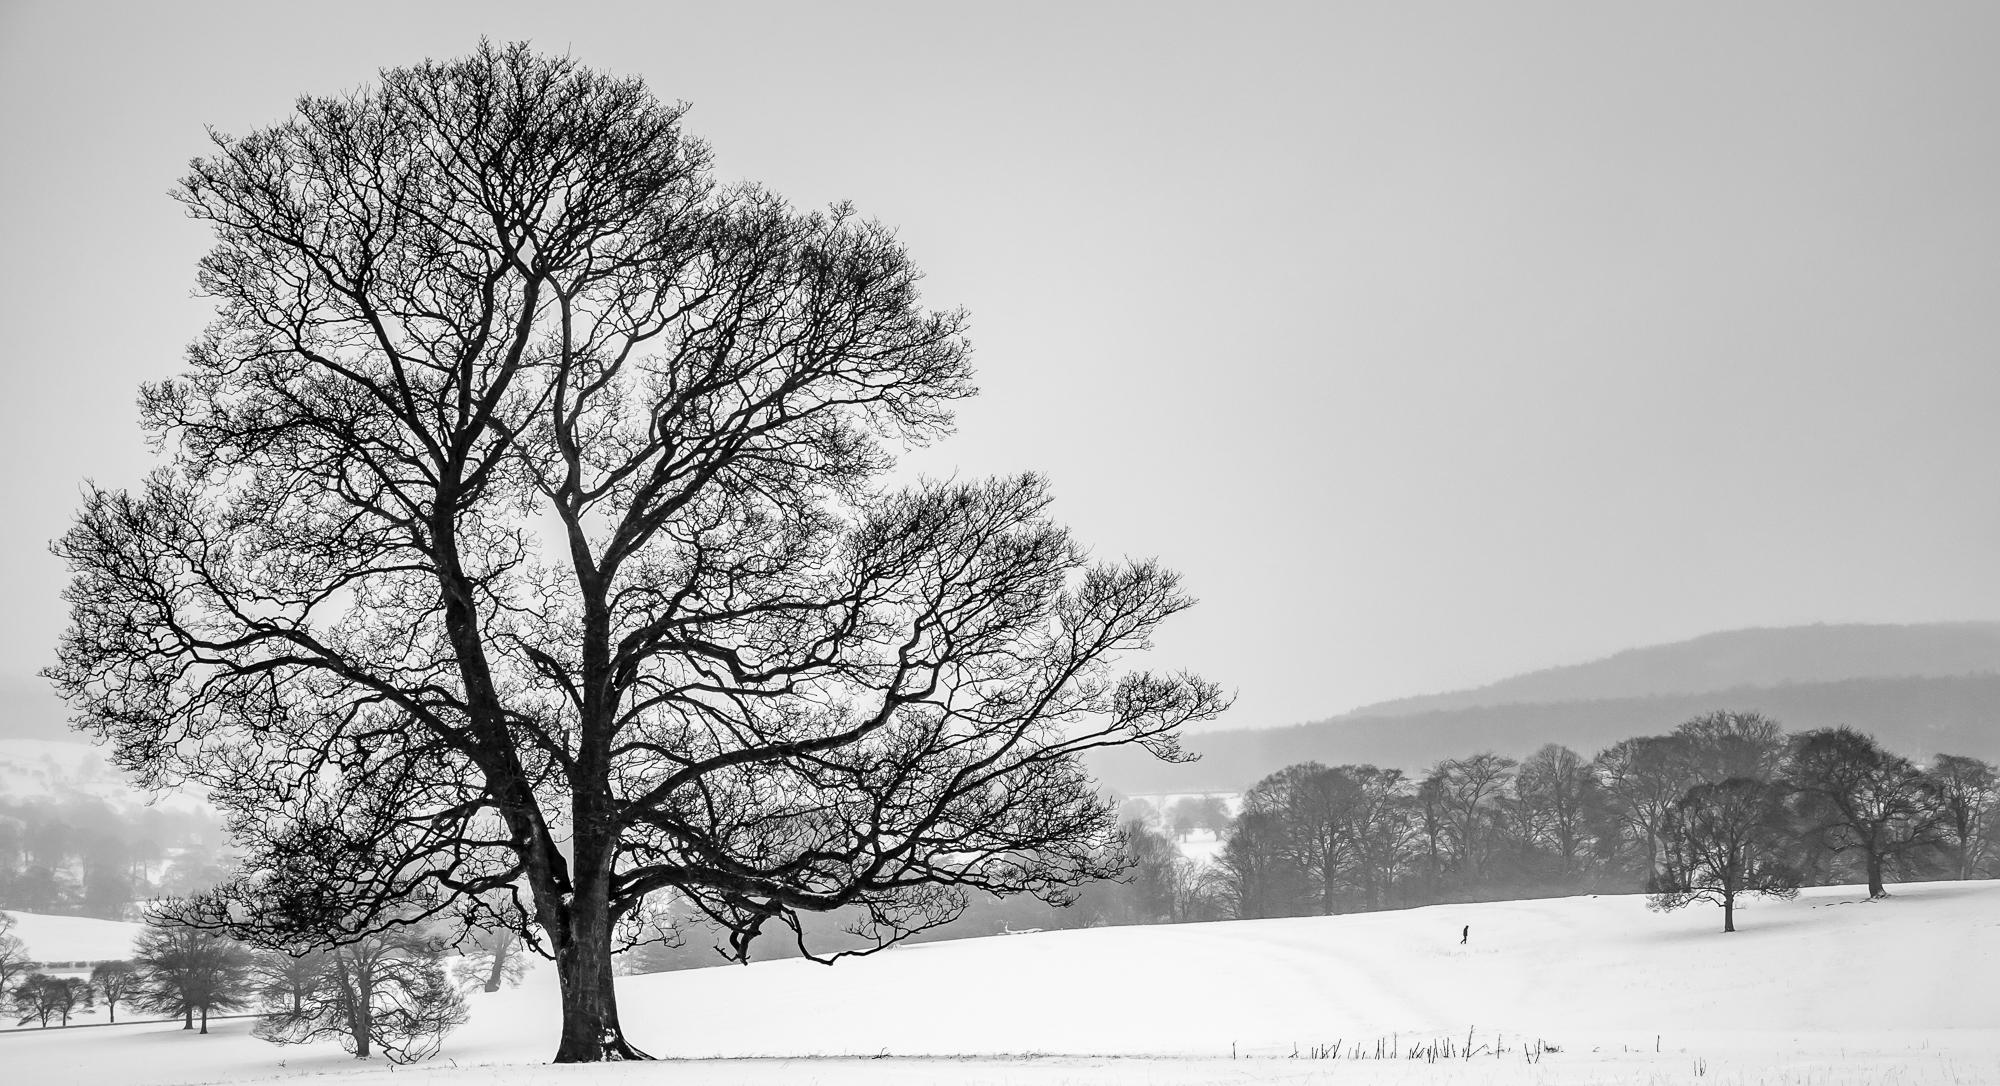 Chatsworth © Mick Ryan